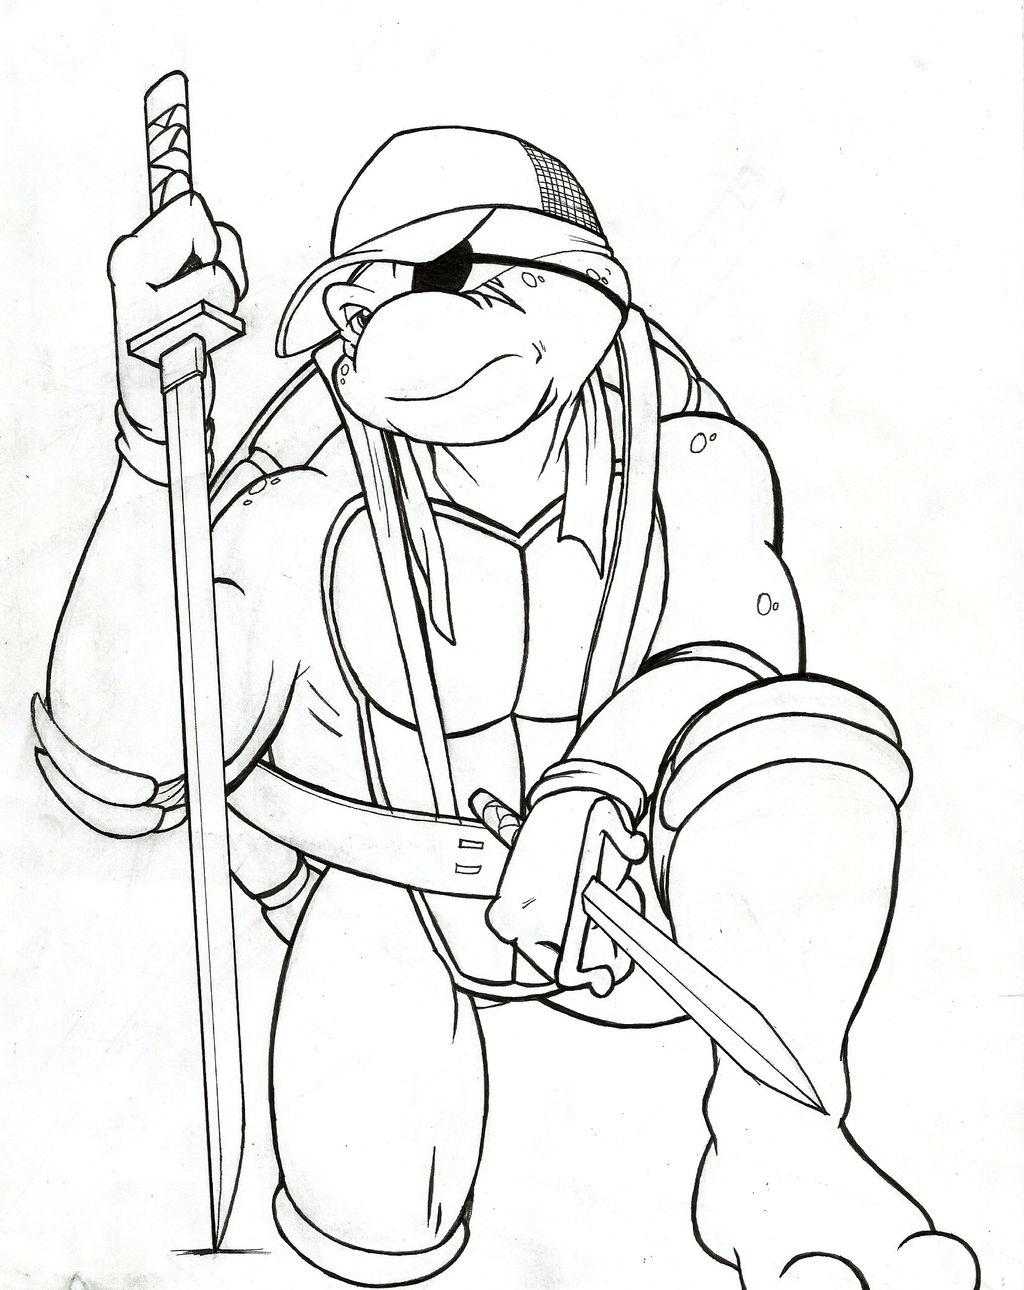 Future Raph - Archie TMNT (Inktober) by JustinGreene